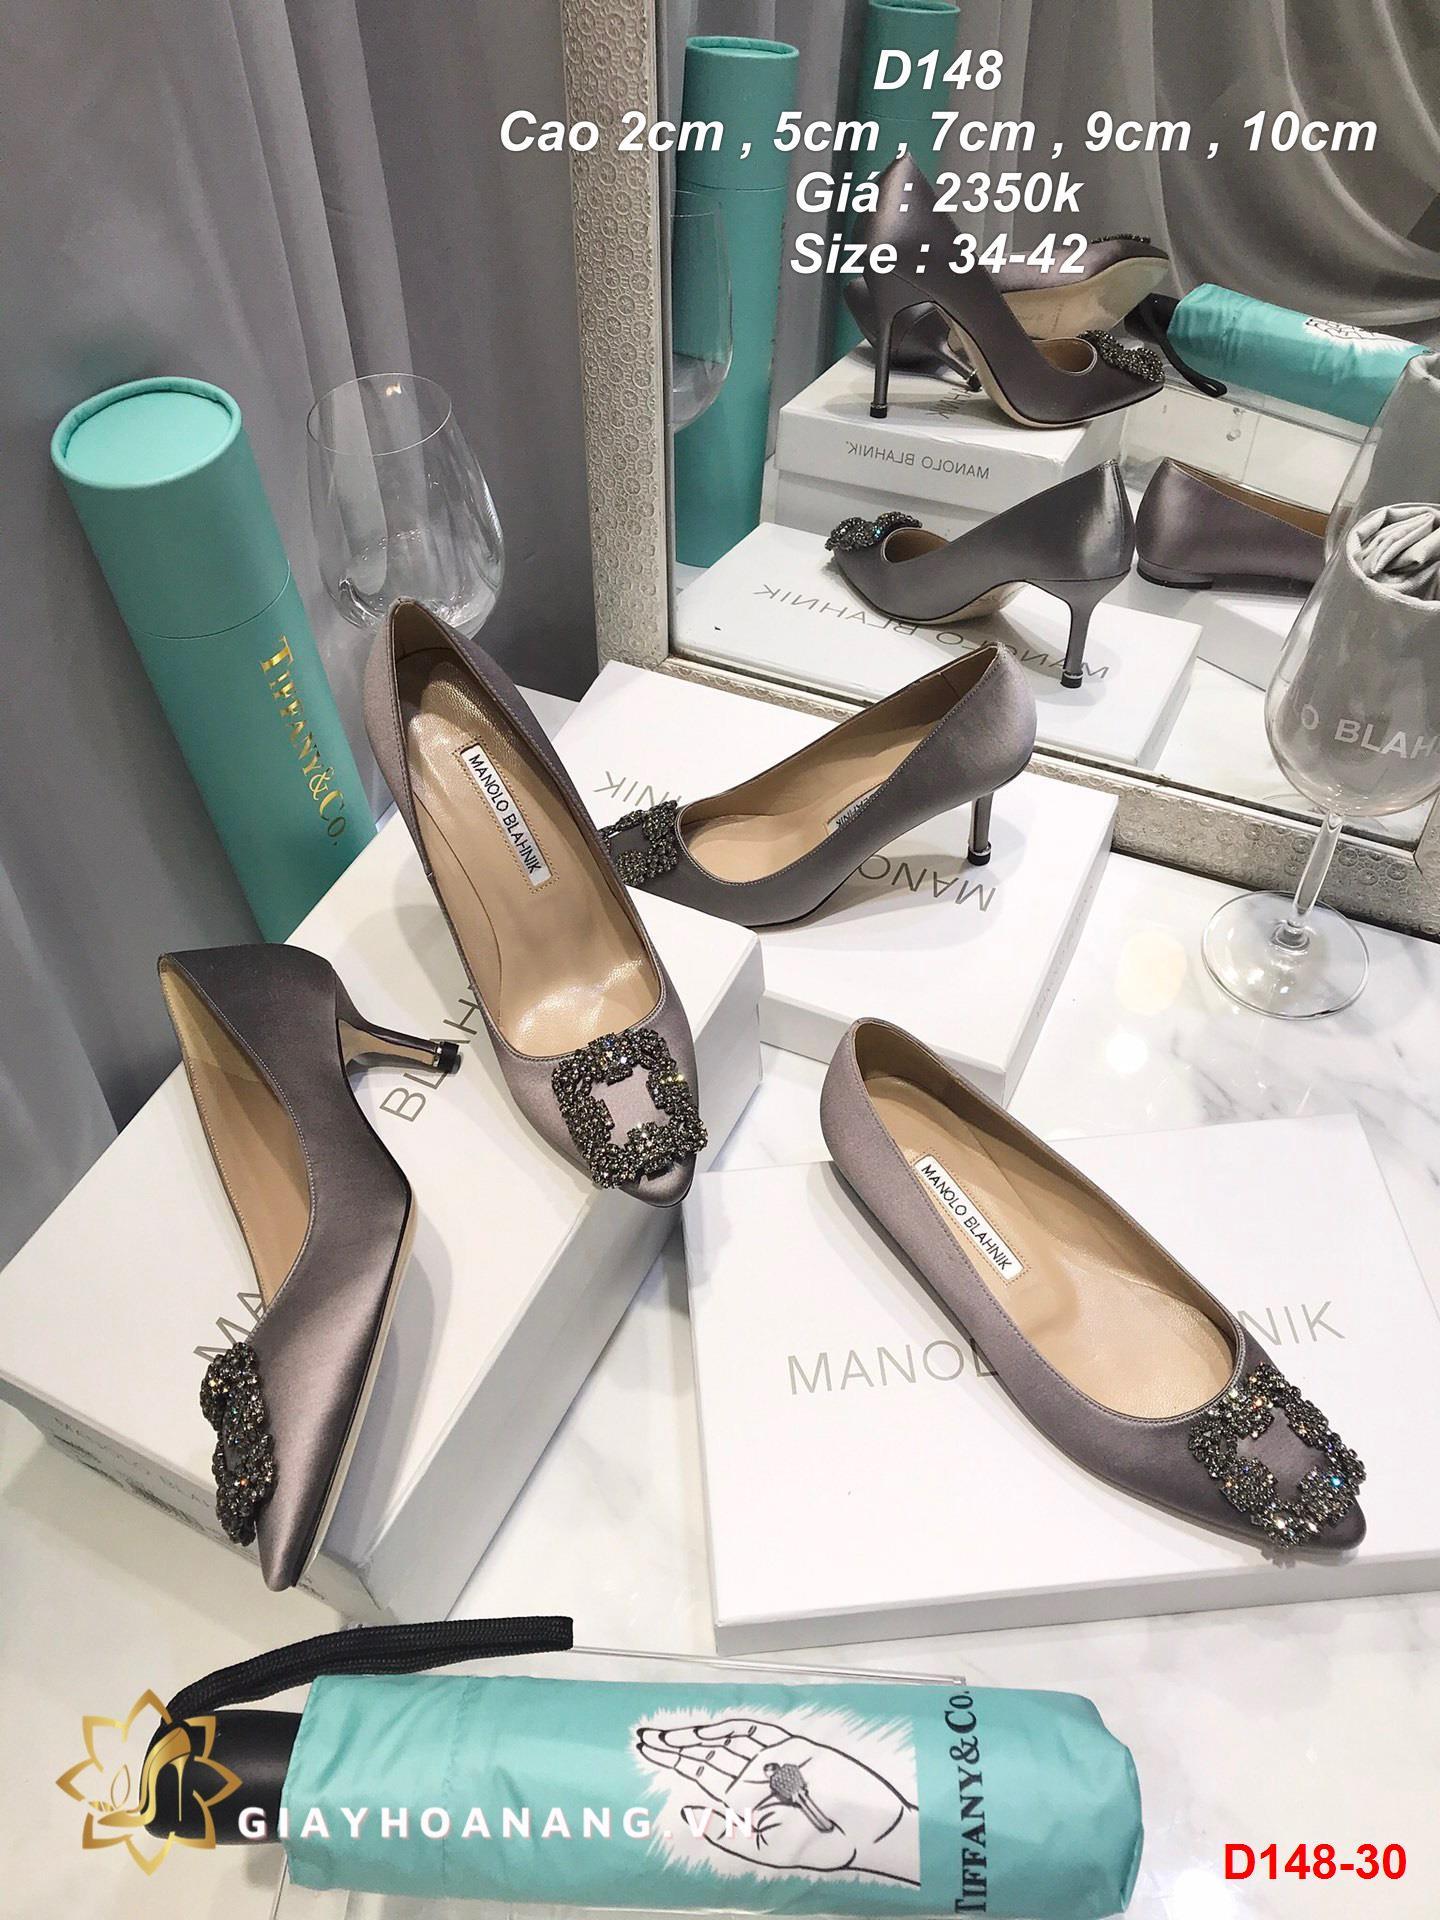 D148-30 Manolo blahnik giày cao 2cm siêu cấp